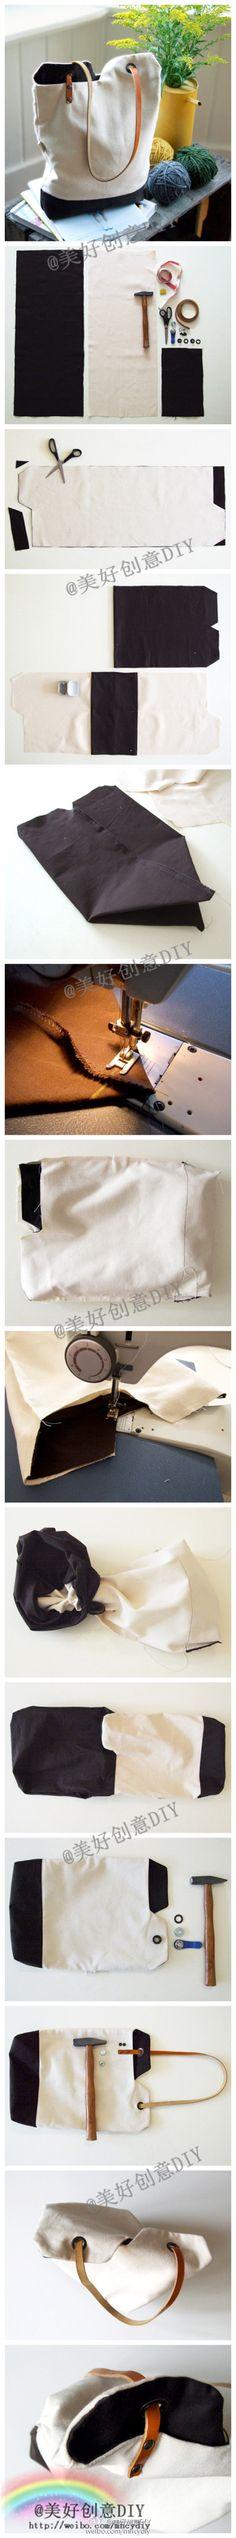 handmade bag!